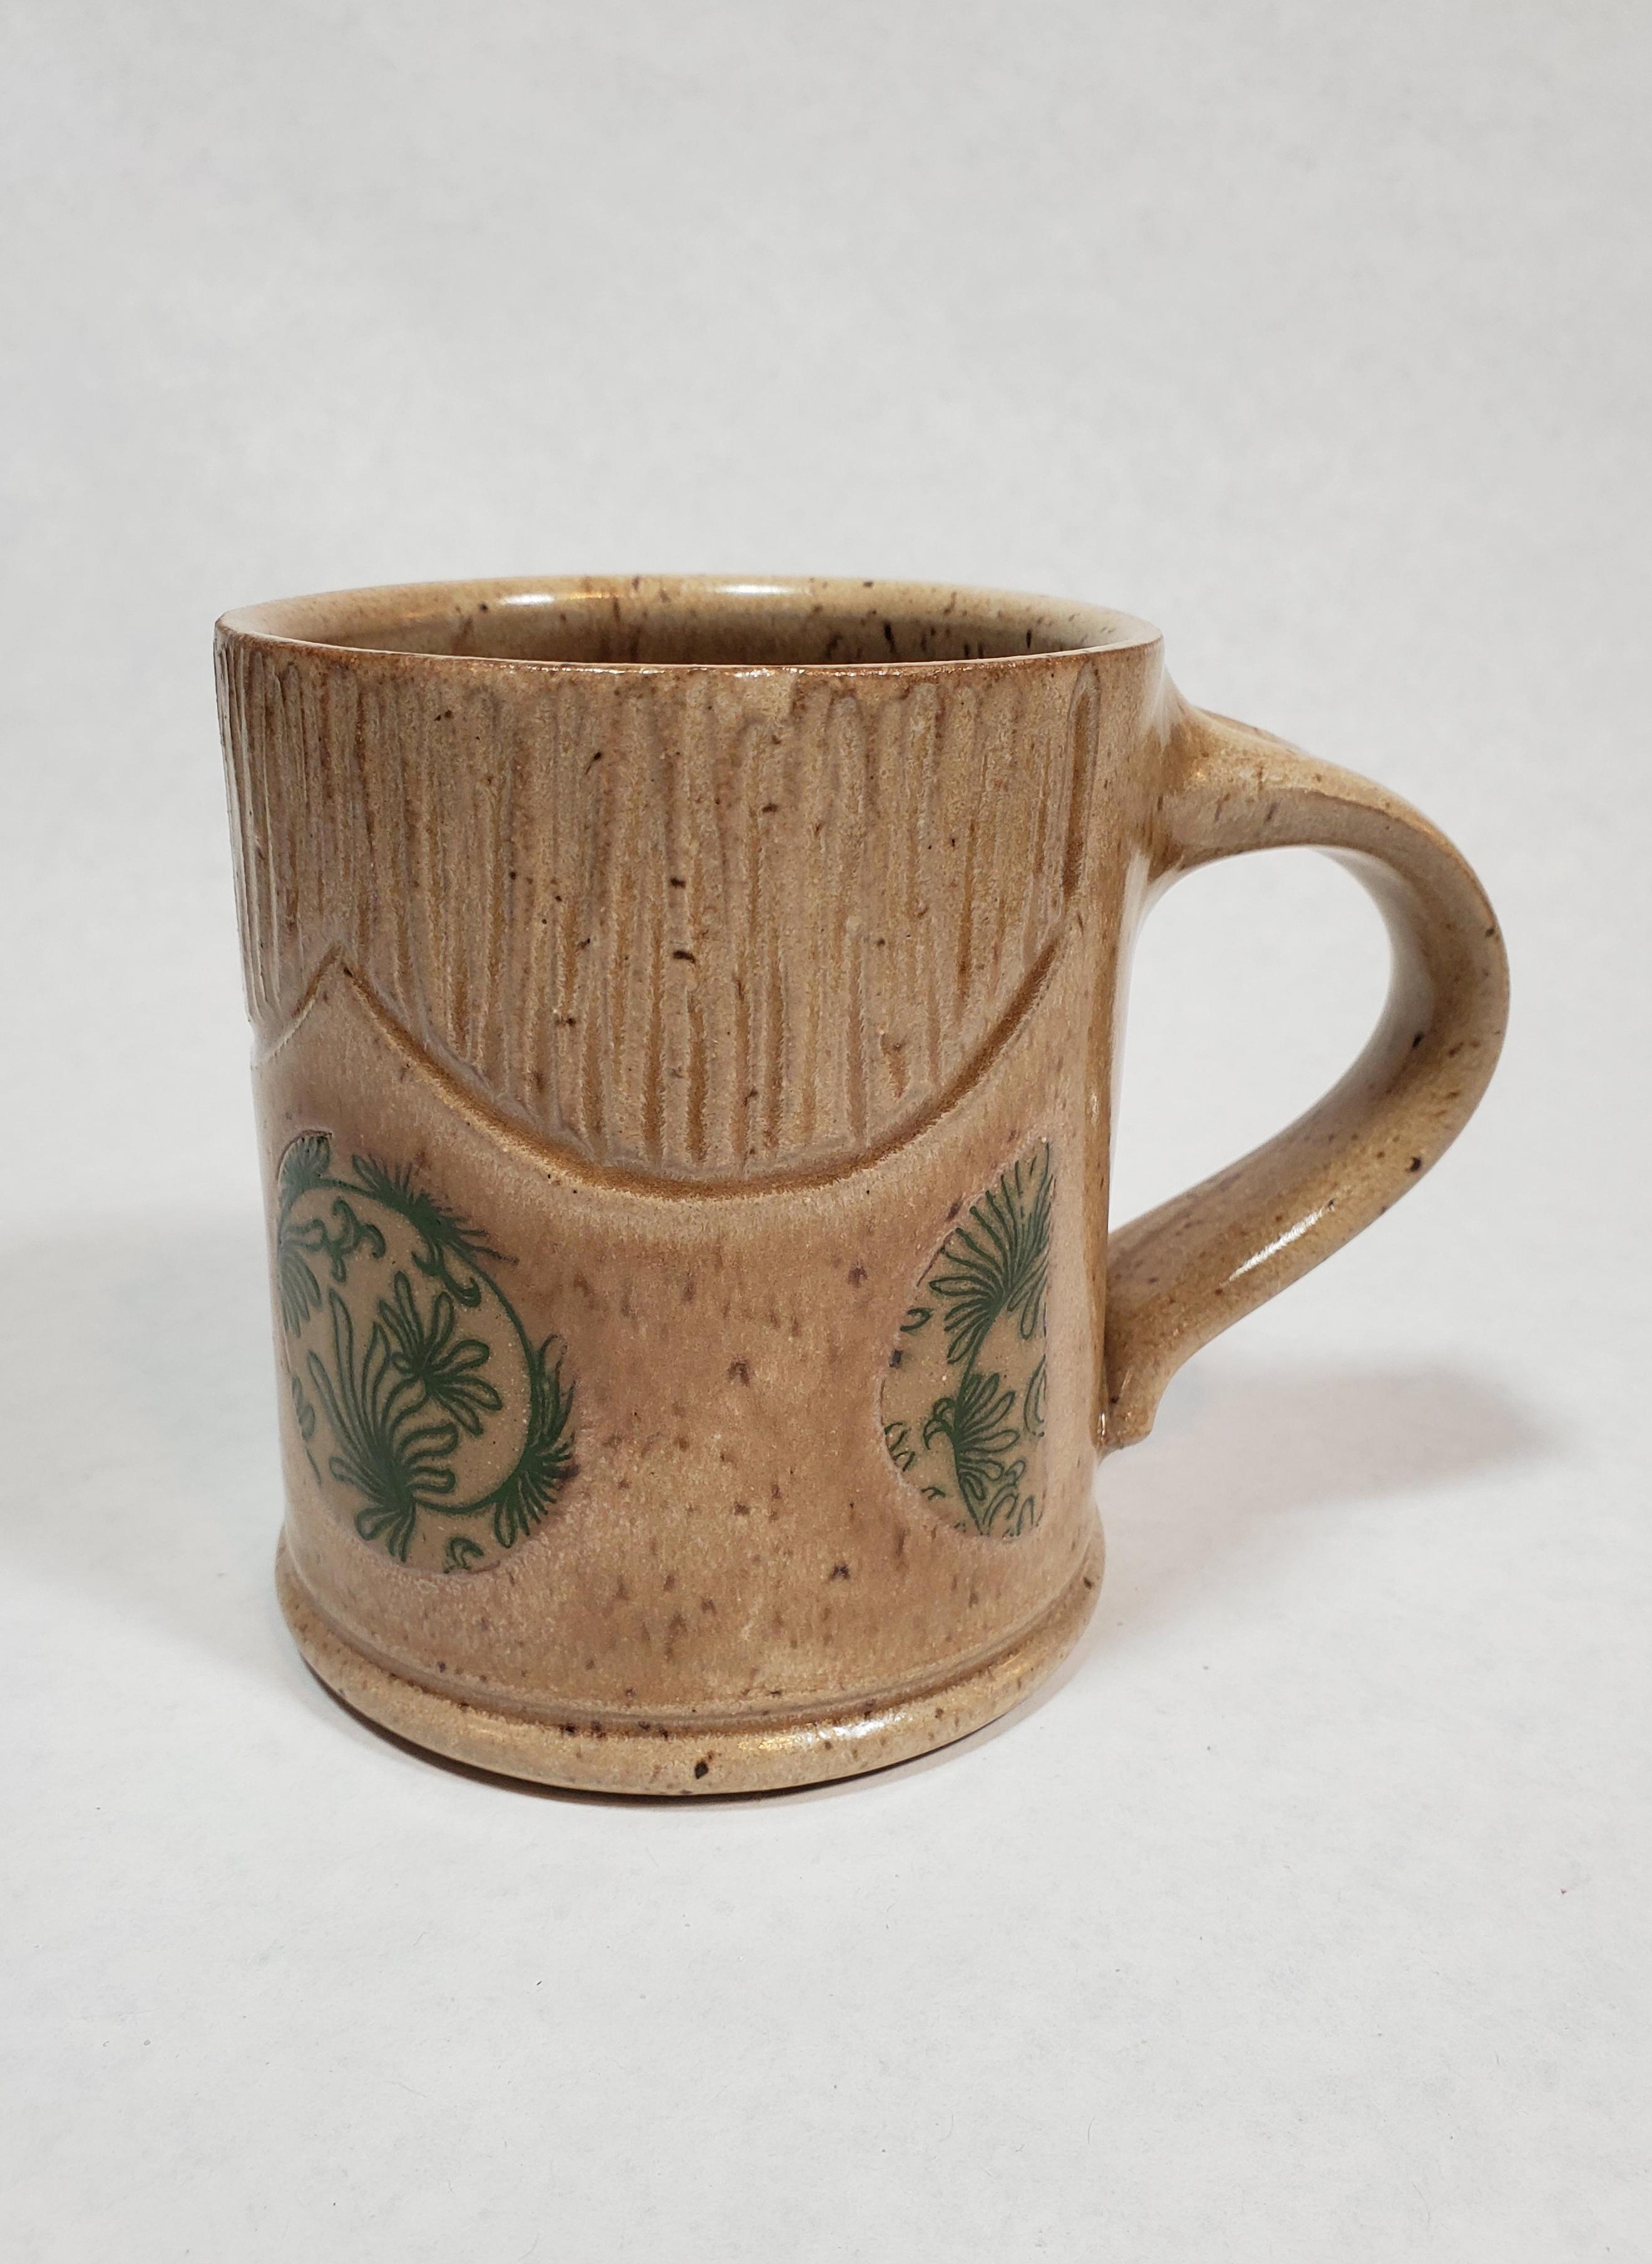 Tan Mug, green floral